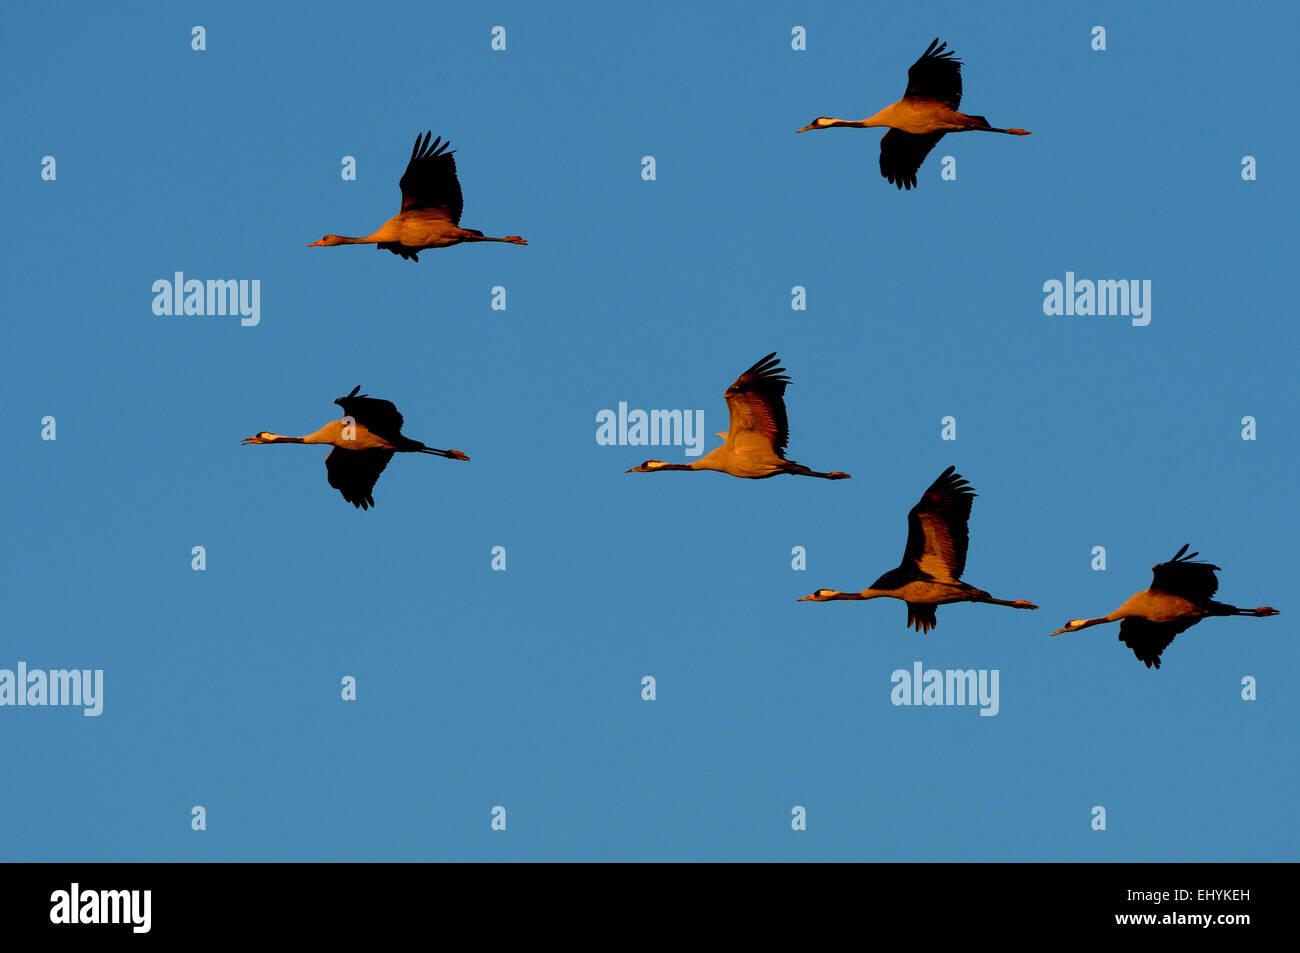 Crane, Grus grus, birds, cranes, gray cranes, wading bird, Mecklenburg-West Pomerania, bird migration, Germany - Stock Image